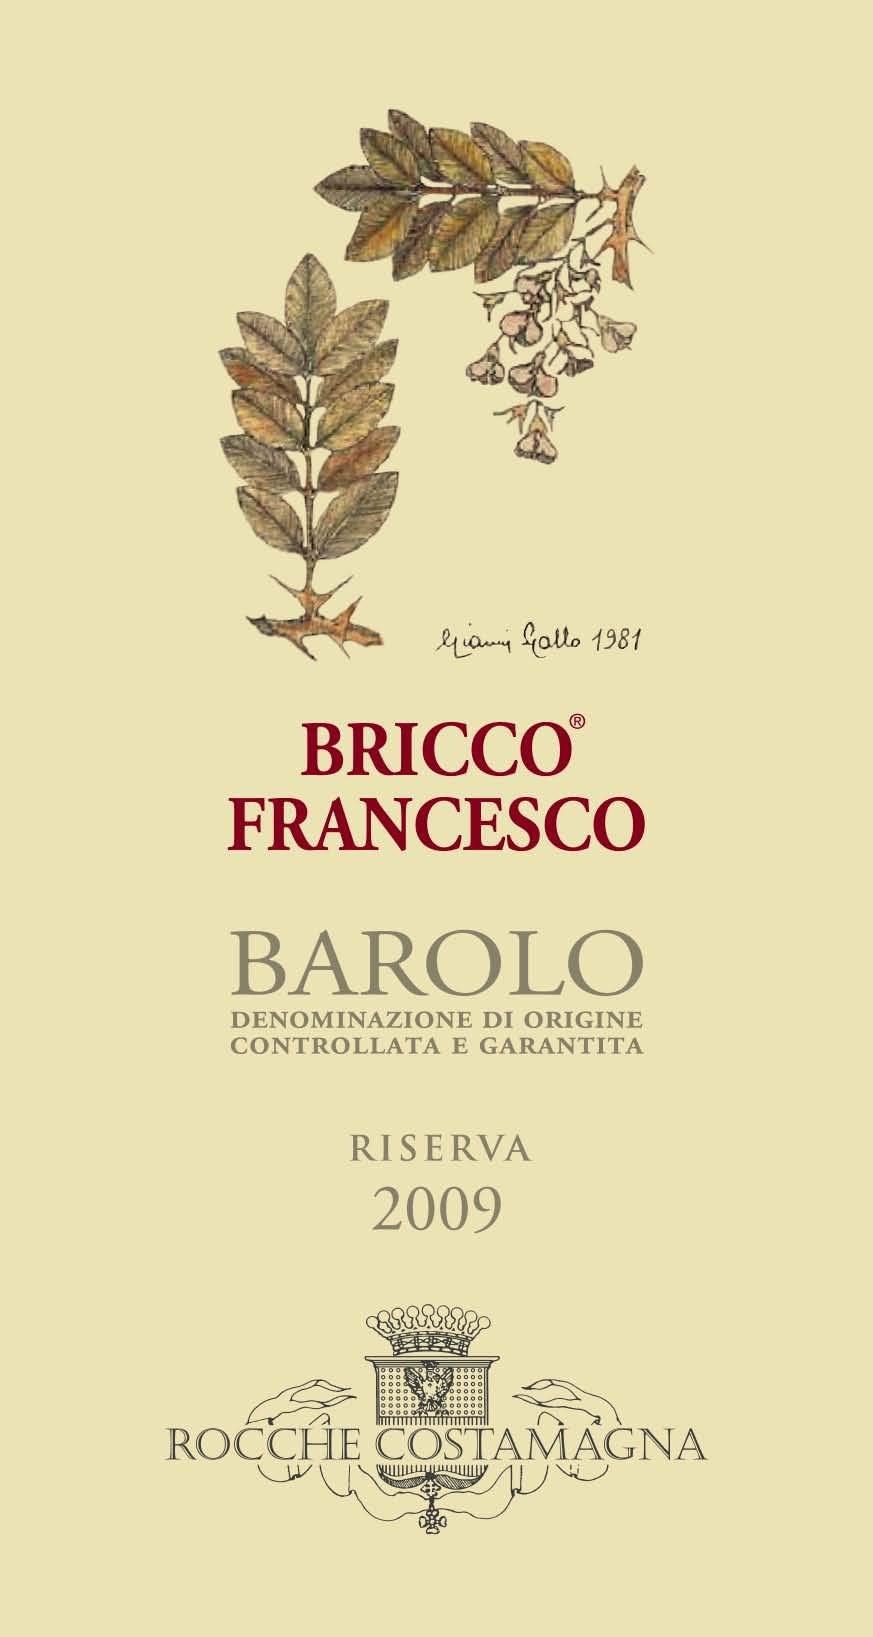 Costamagna Barolo Bricco Francesco Riserva Jeroboam 2011